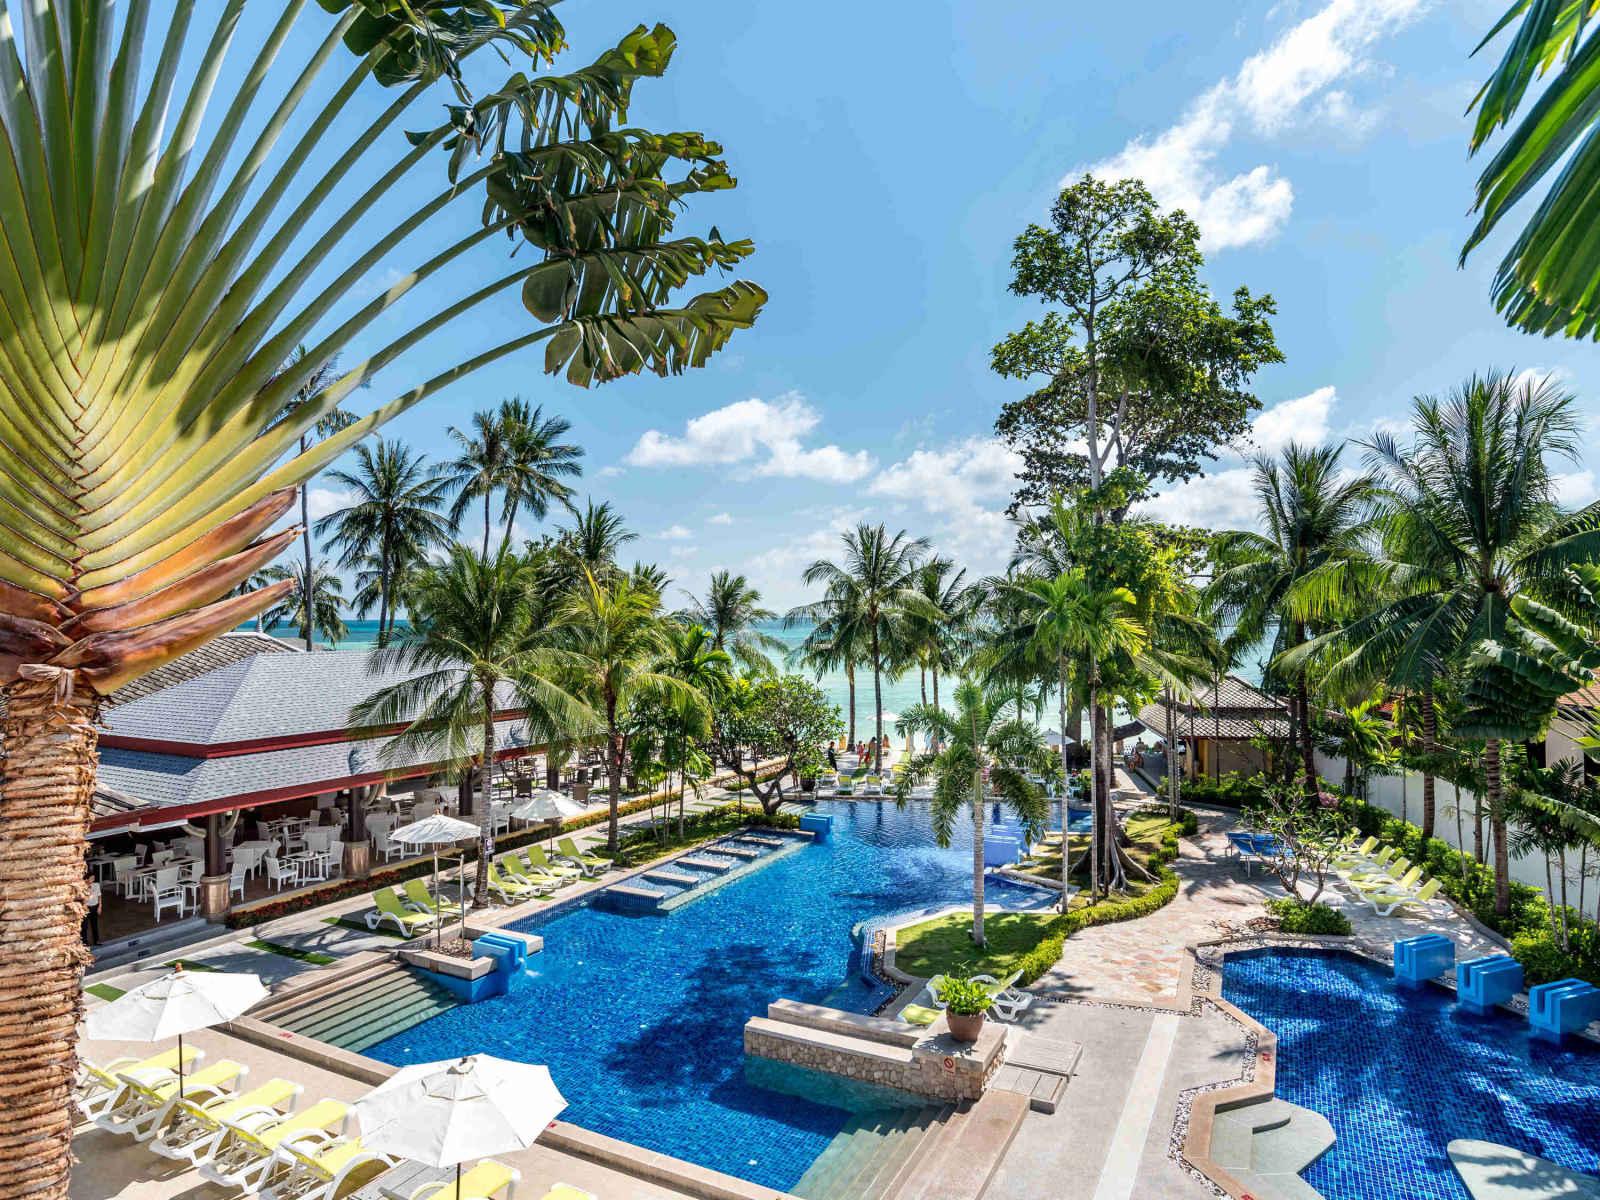 Novotel Samui Resort Chaweng - 4*